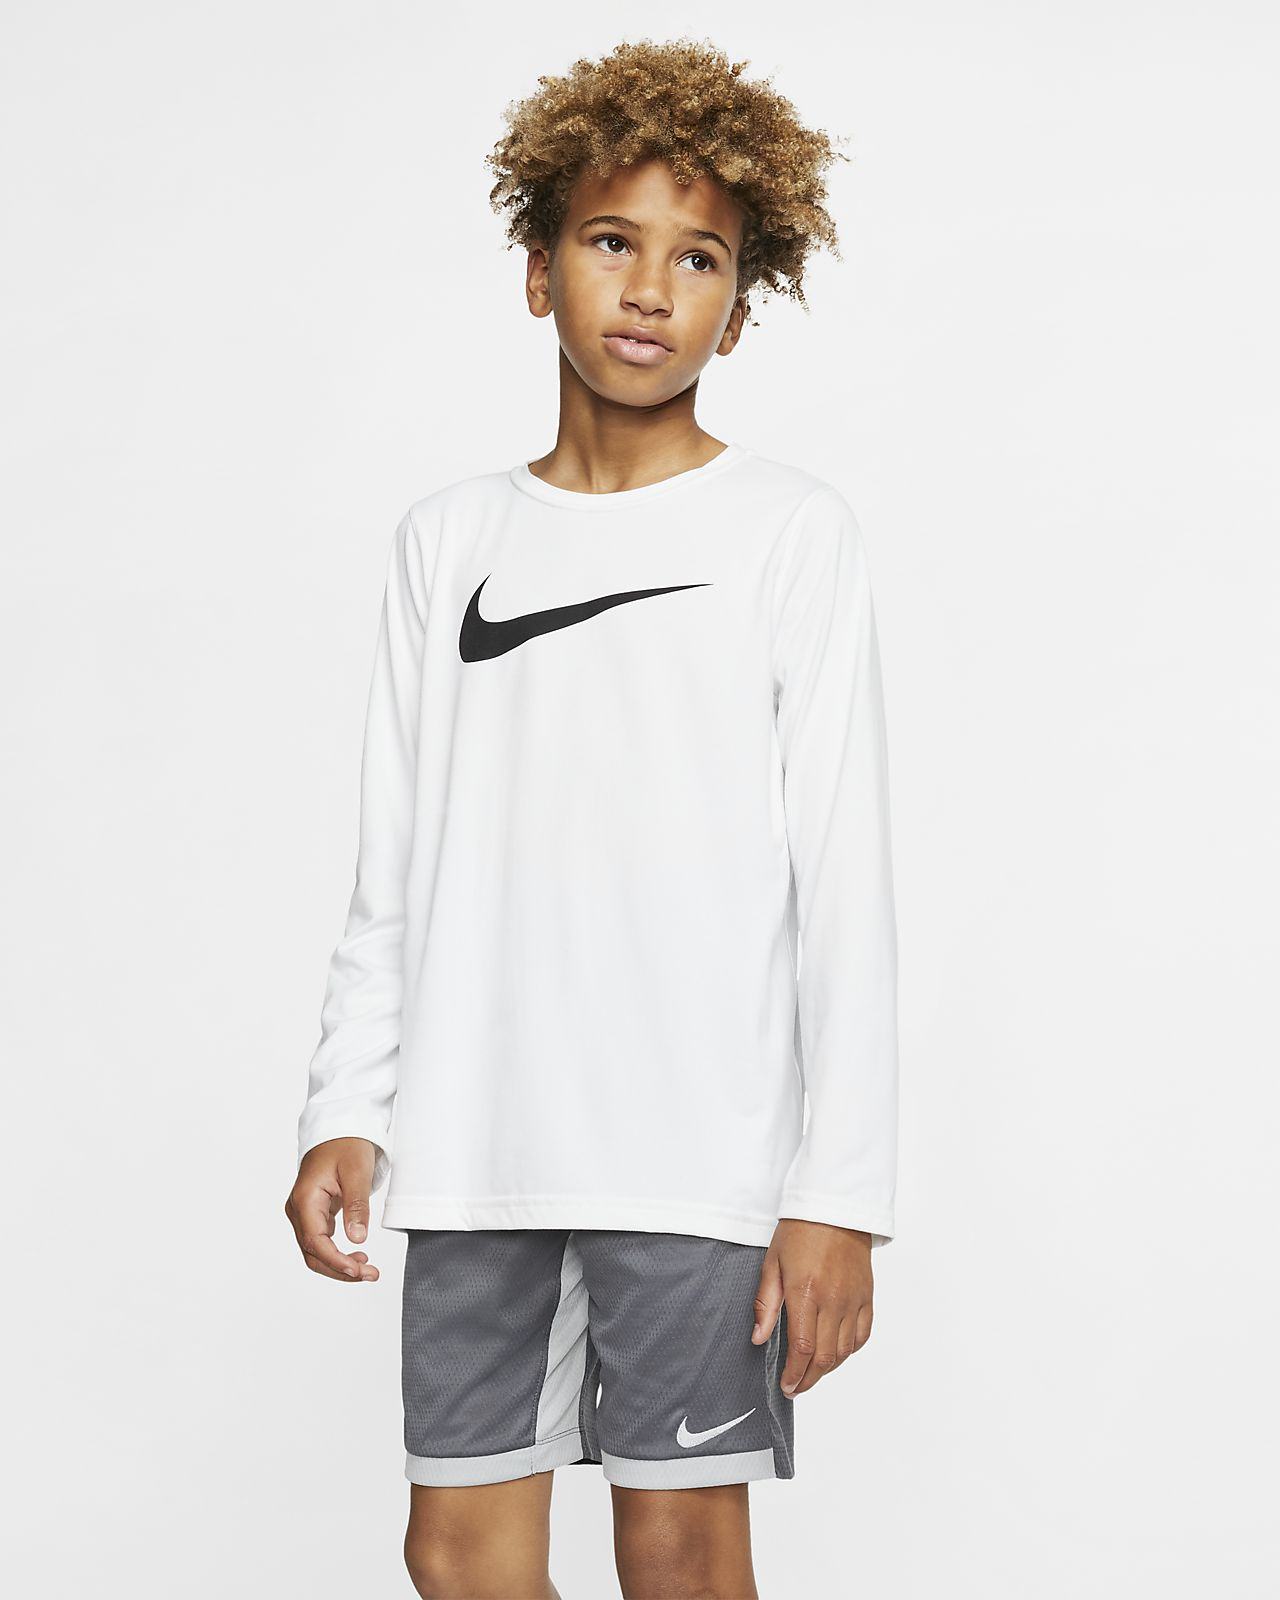 Nike Dri-FIT Big Kids' Long-Sleeve Training T-Shirt